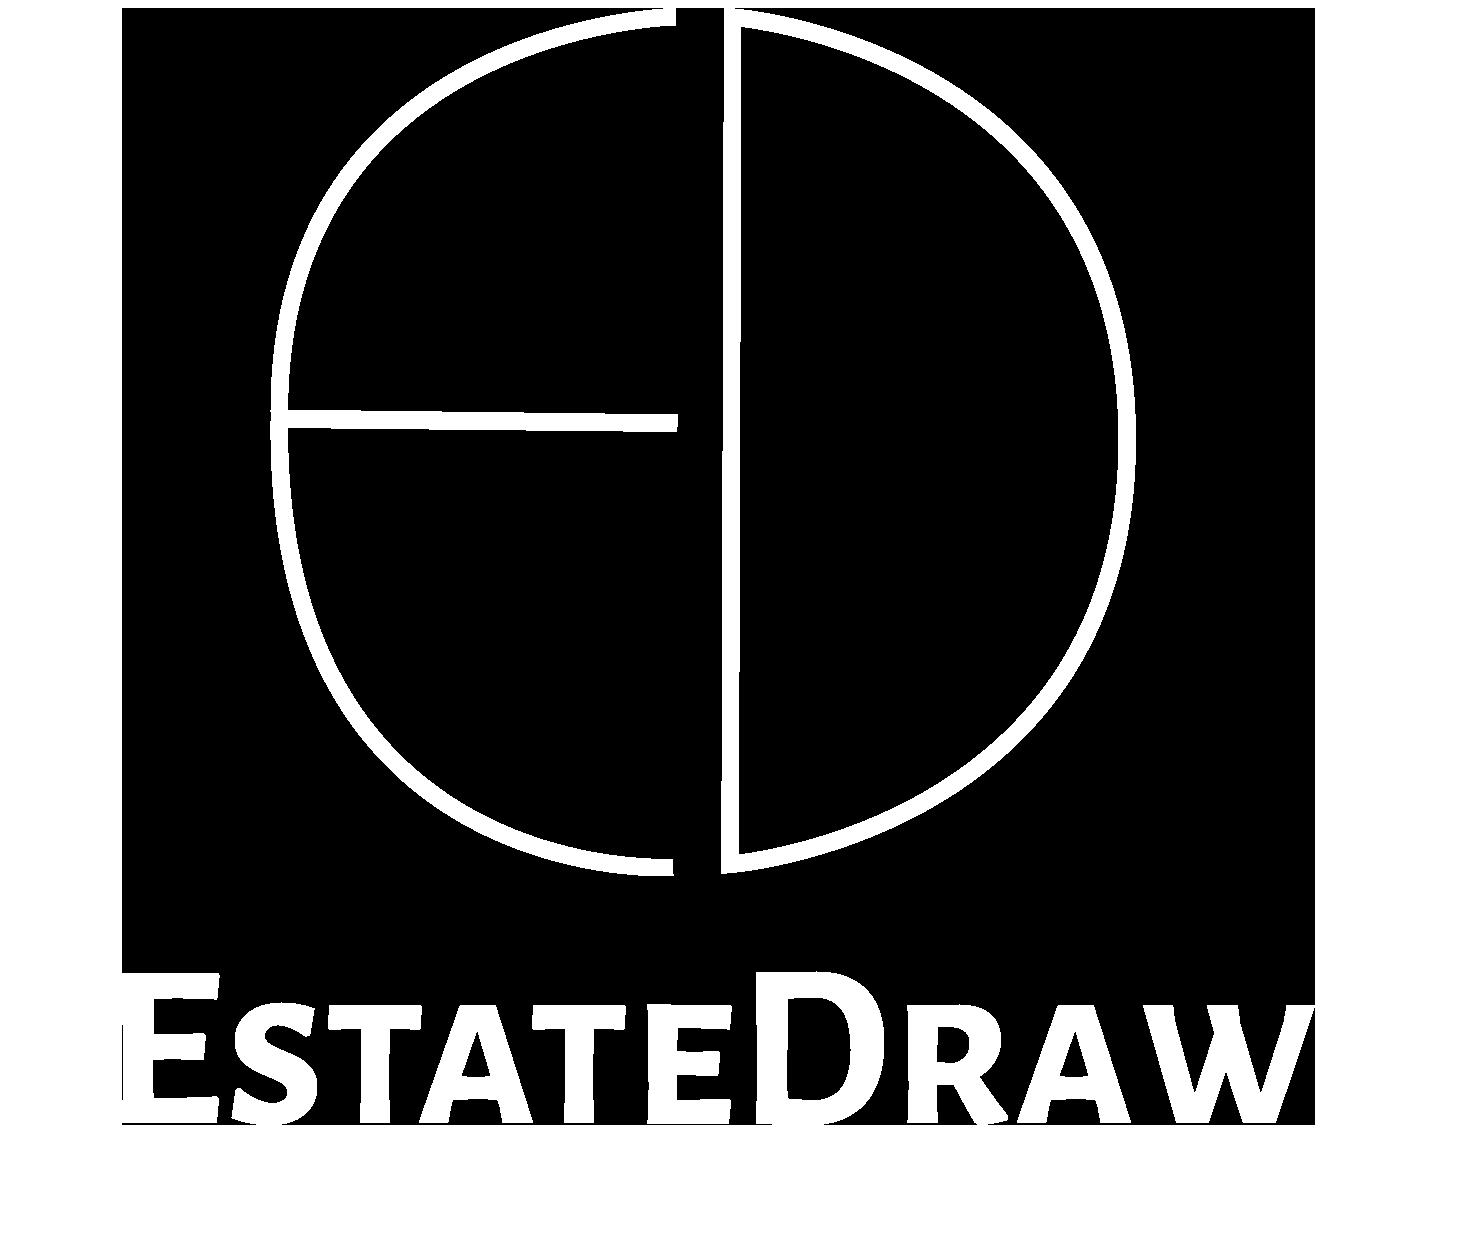 Estatedrawlogo white try 2